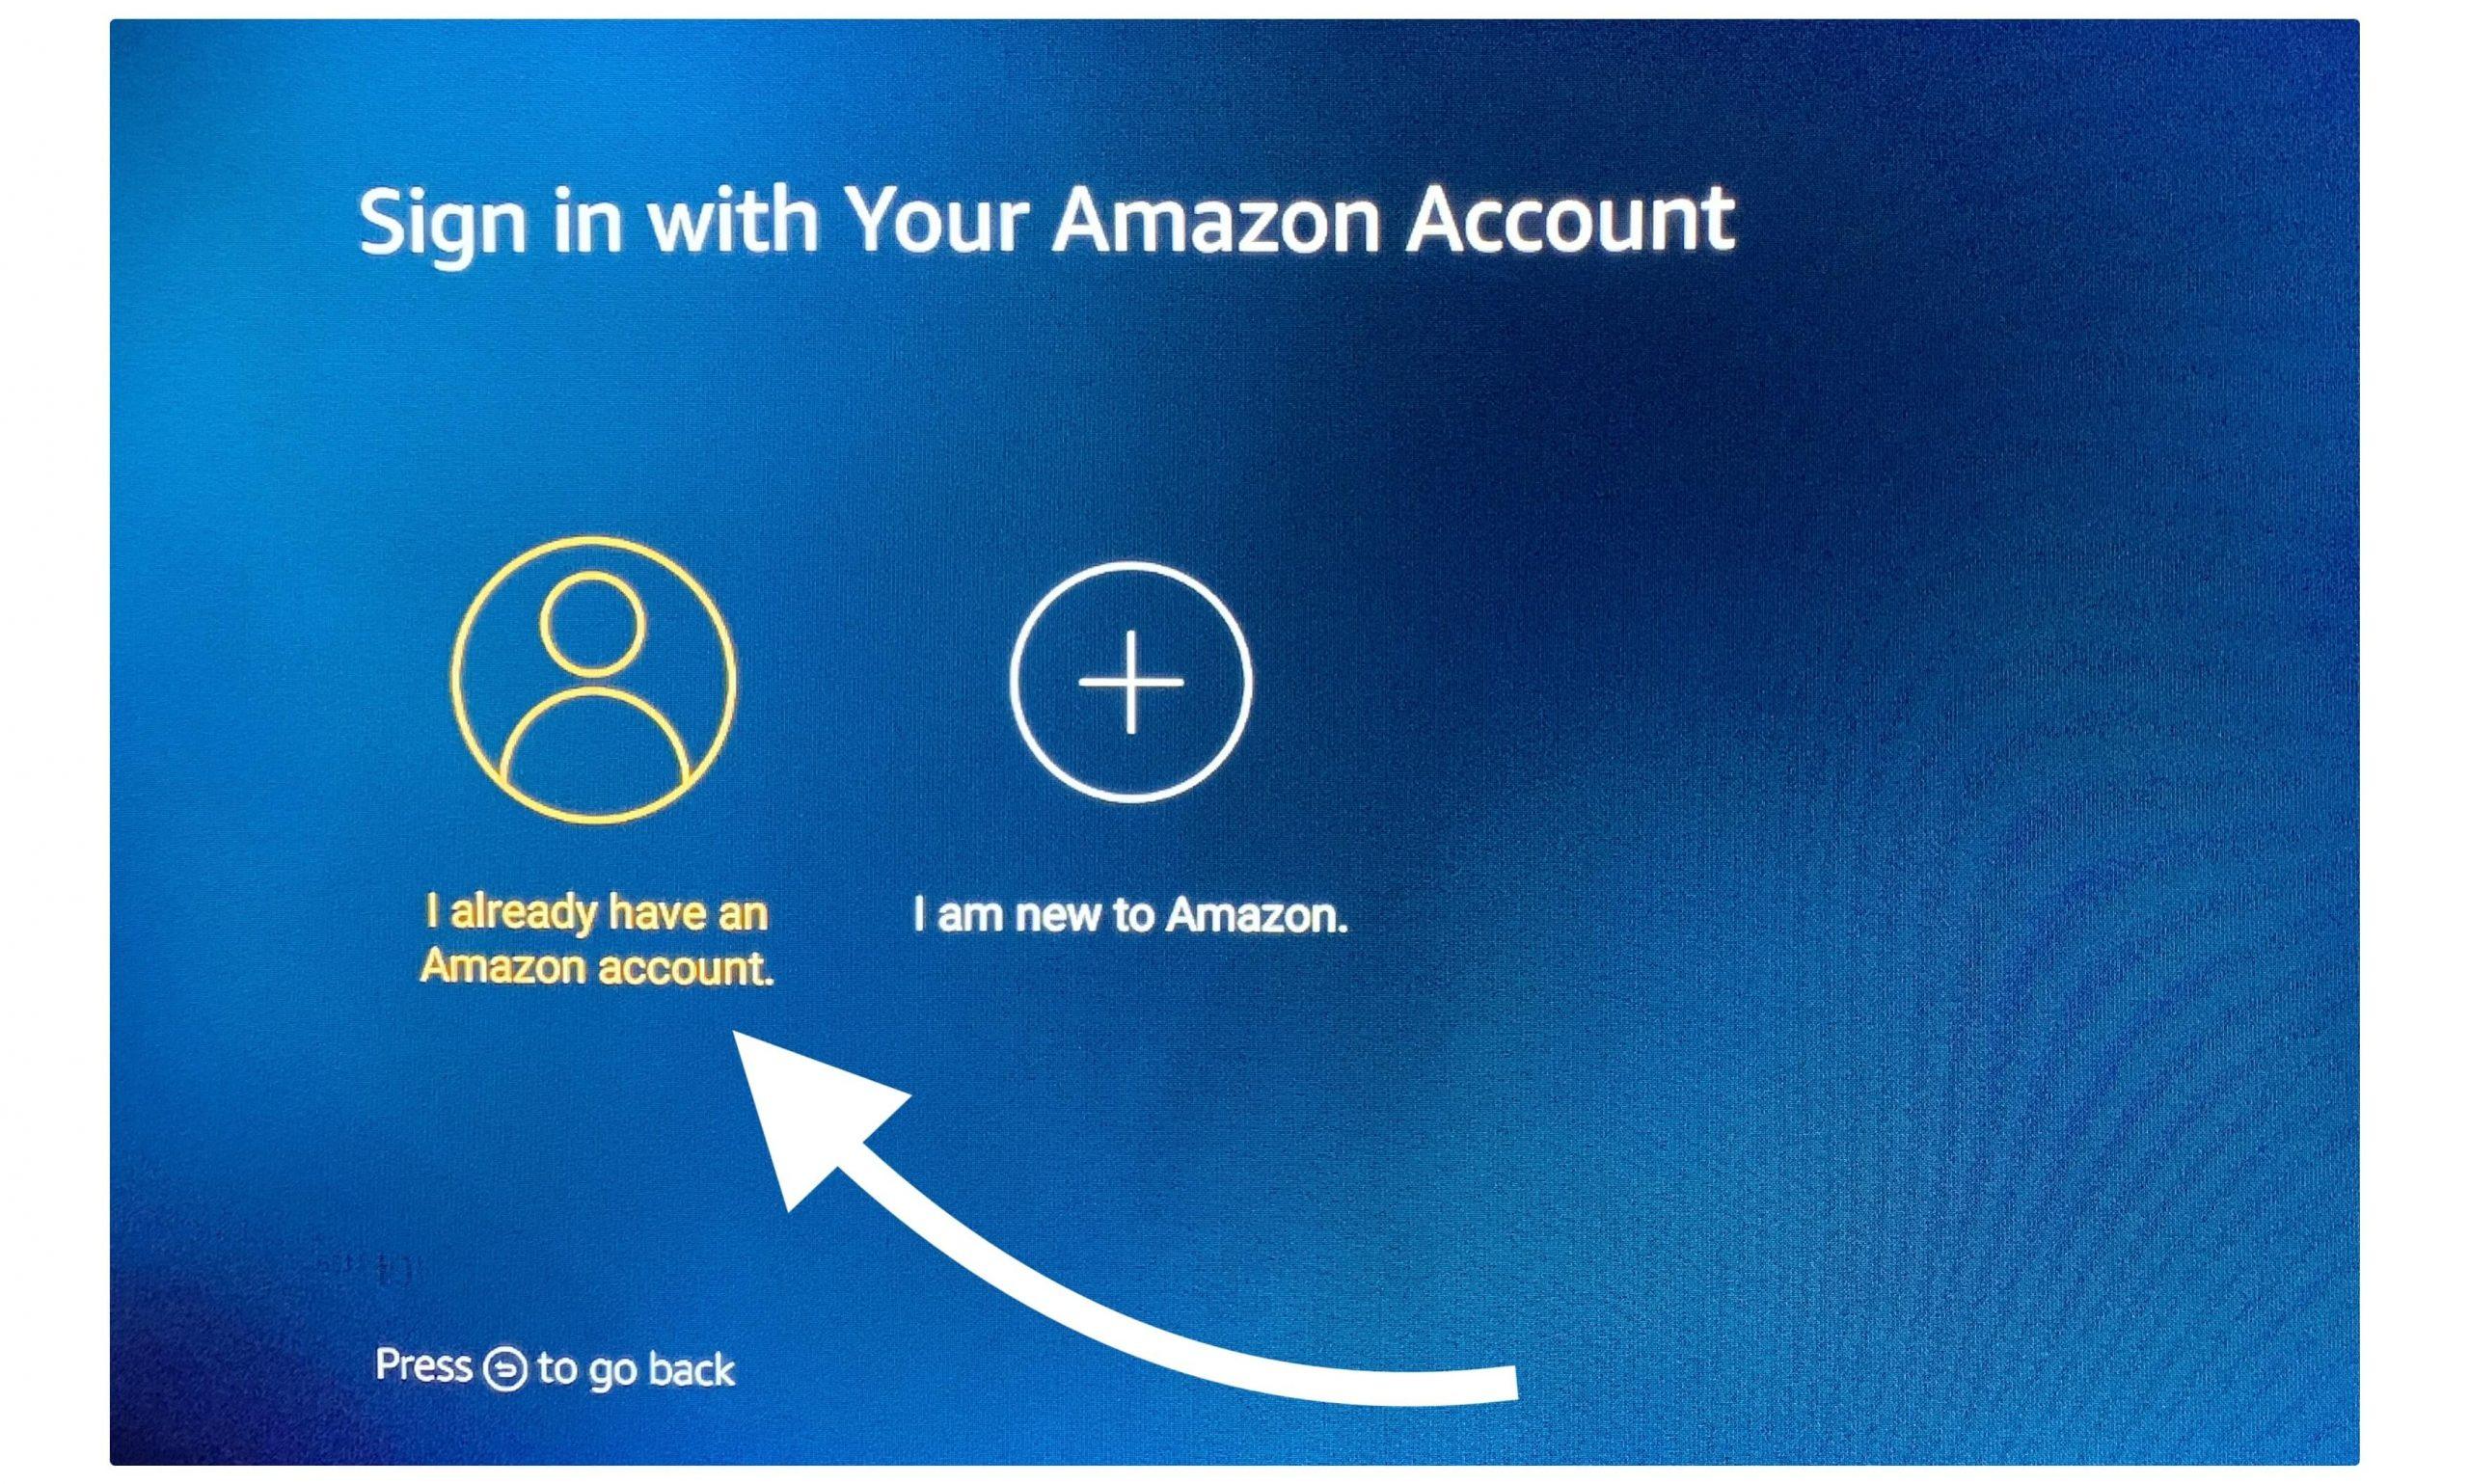 Setup-Amazon-Account-On-Firestick-